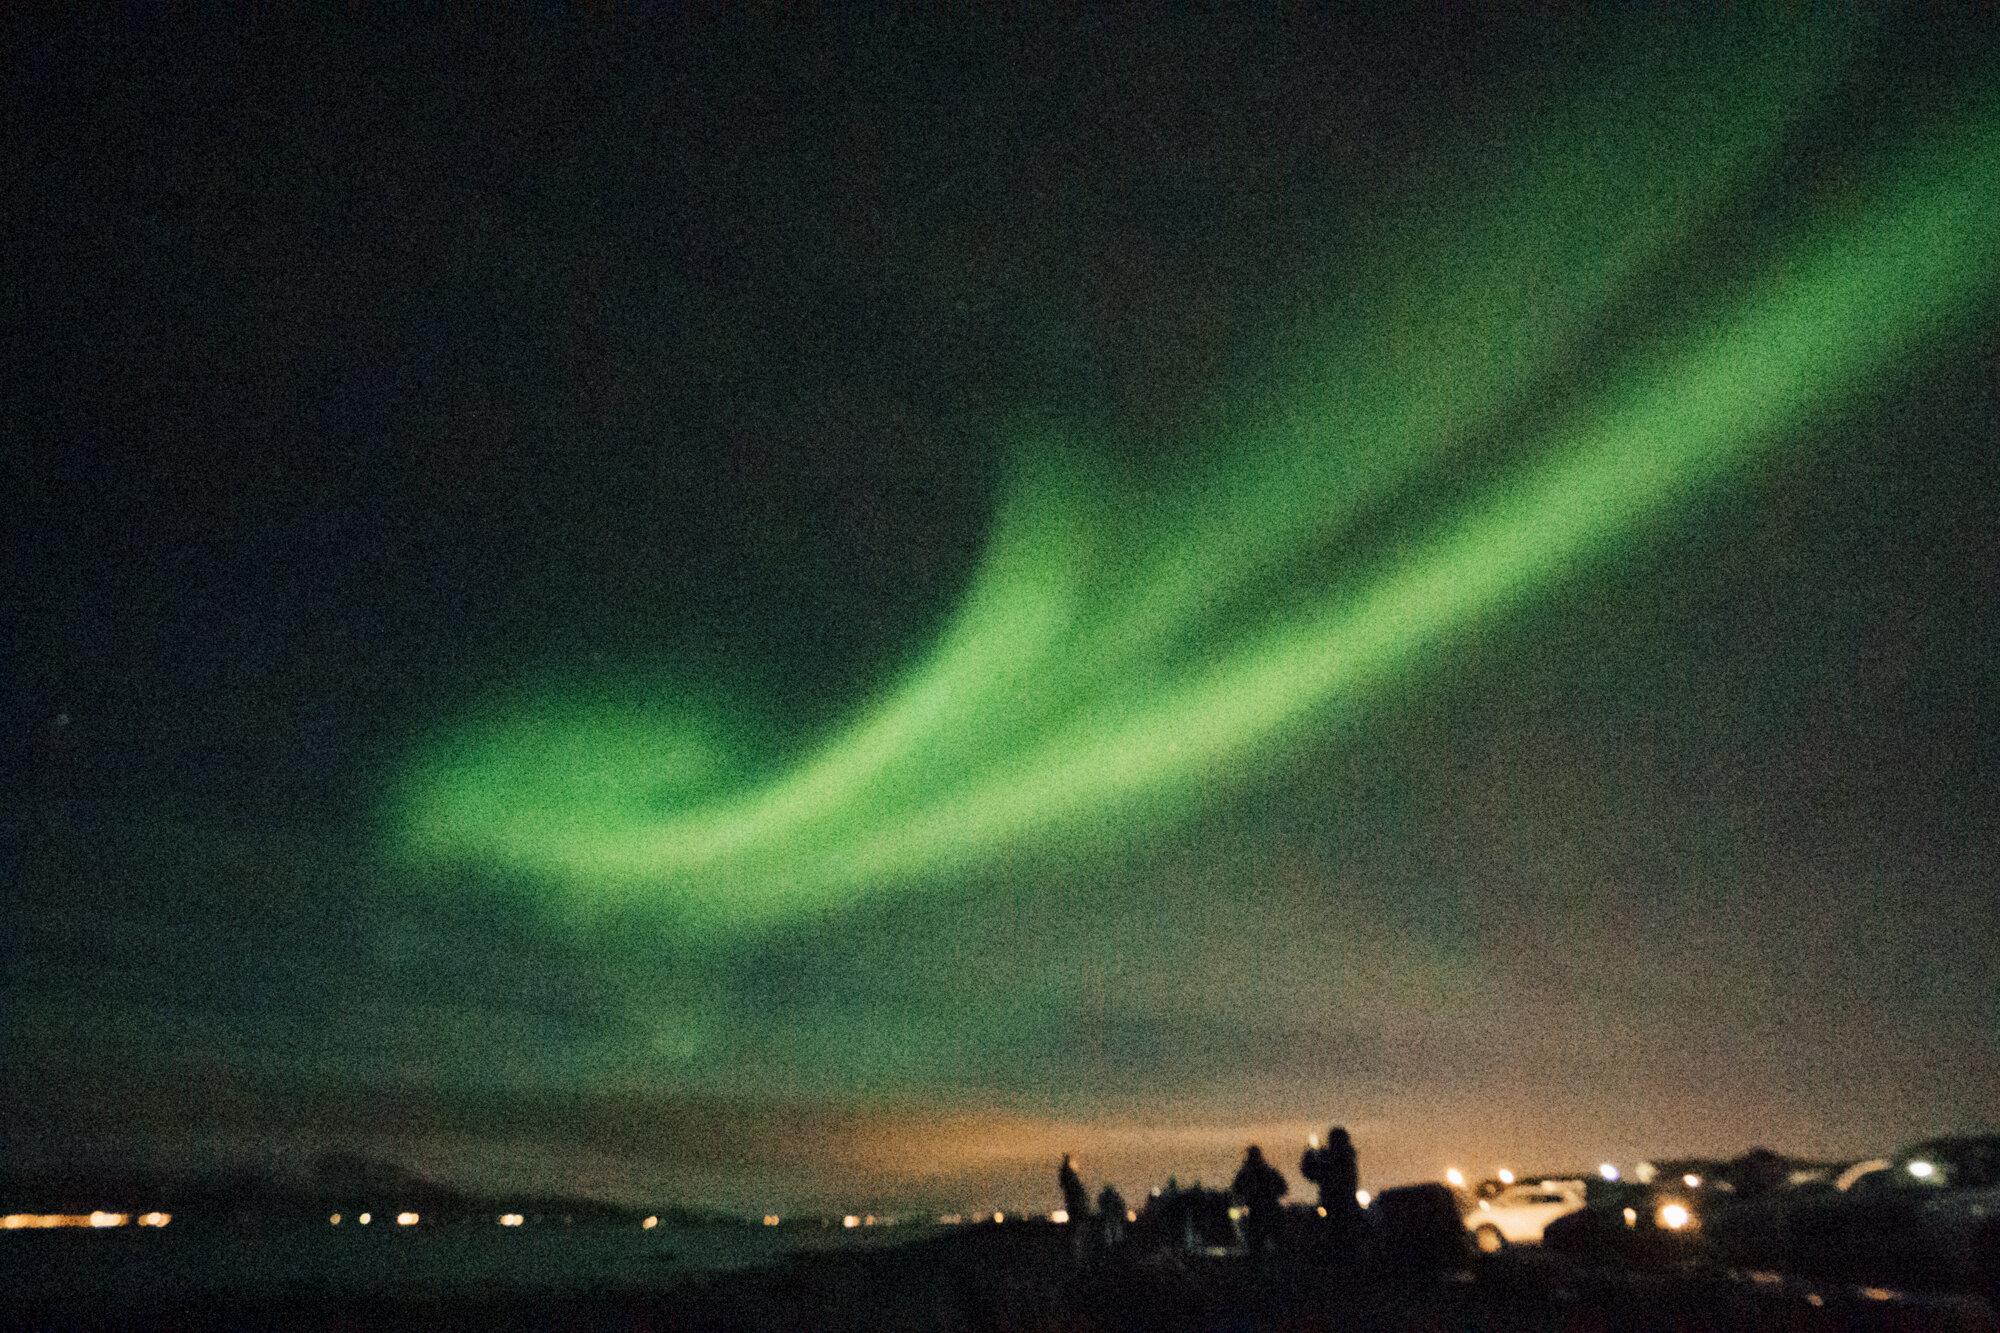 Aurora Borealis的明亮的绿色漩涡在夜空的在雷克雅未克,冰岛